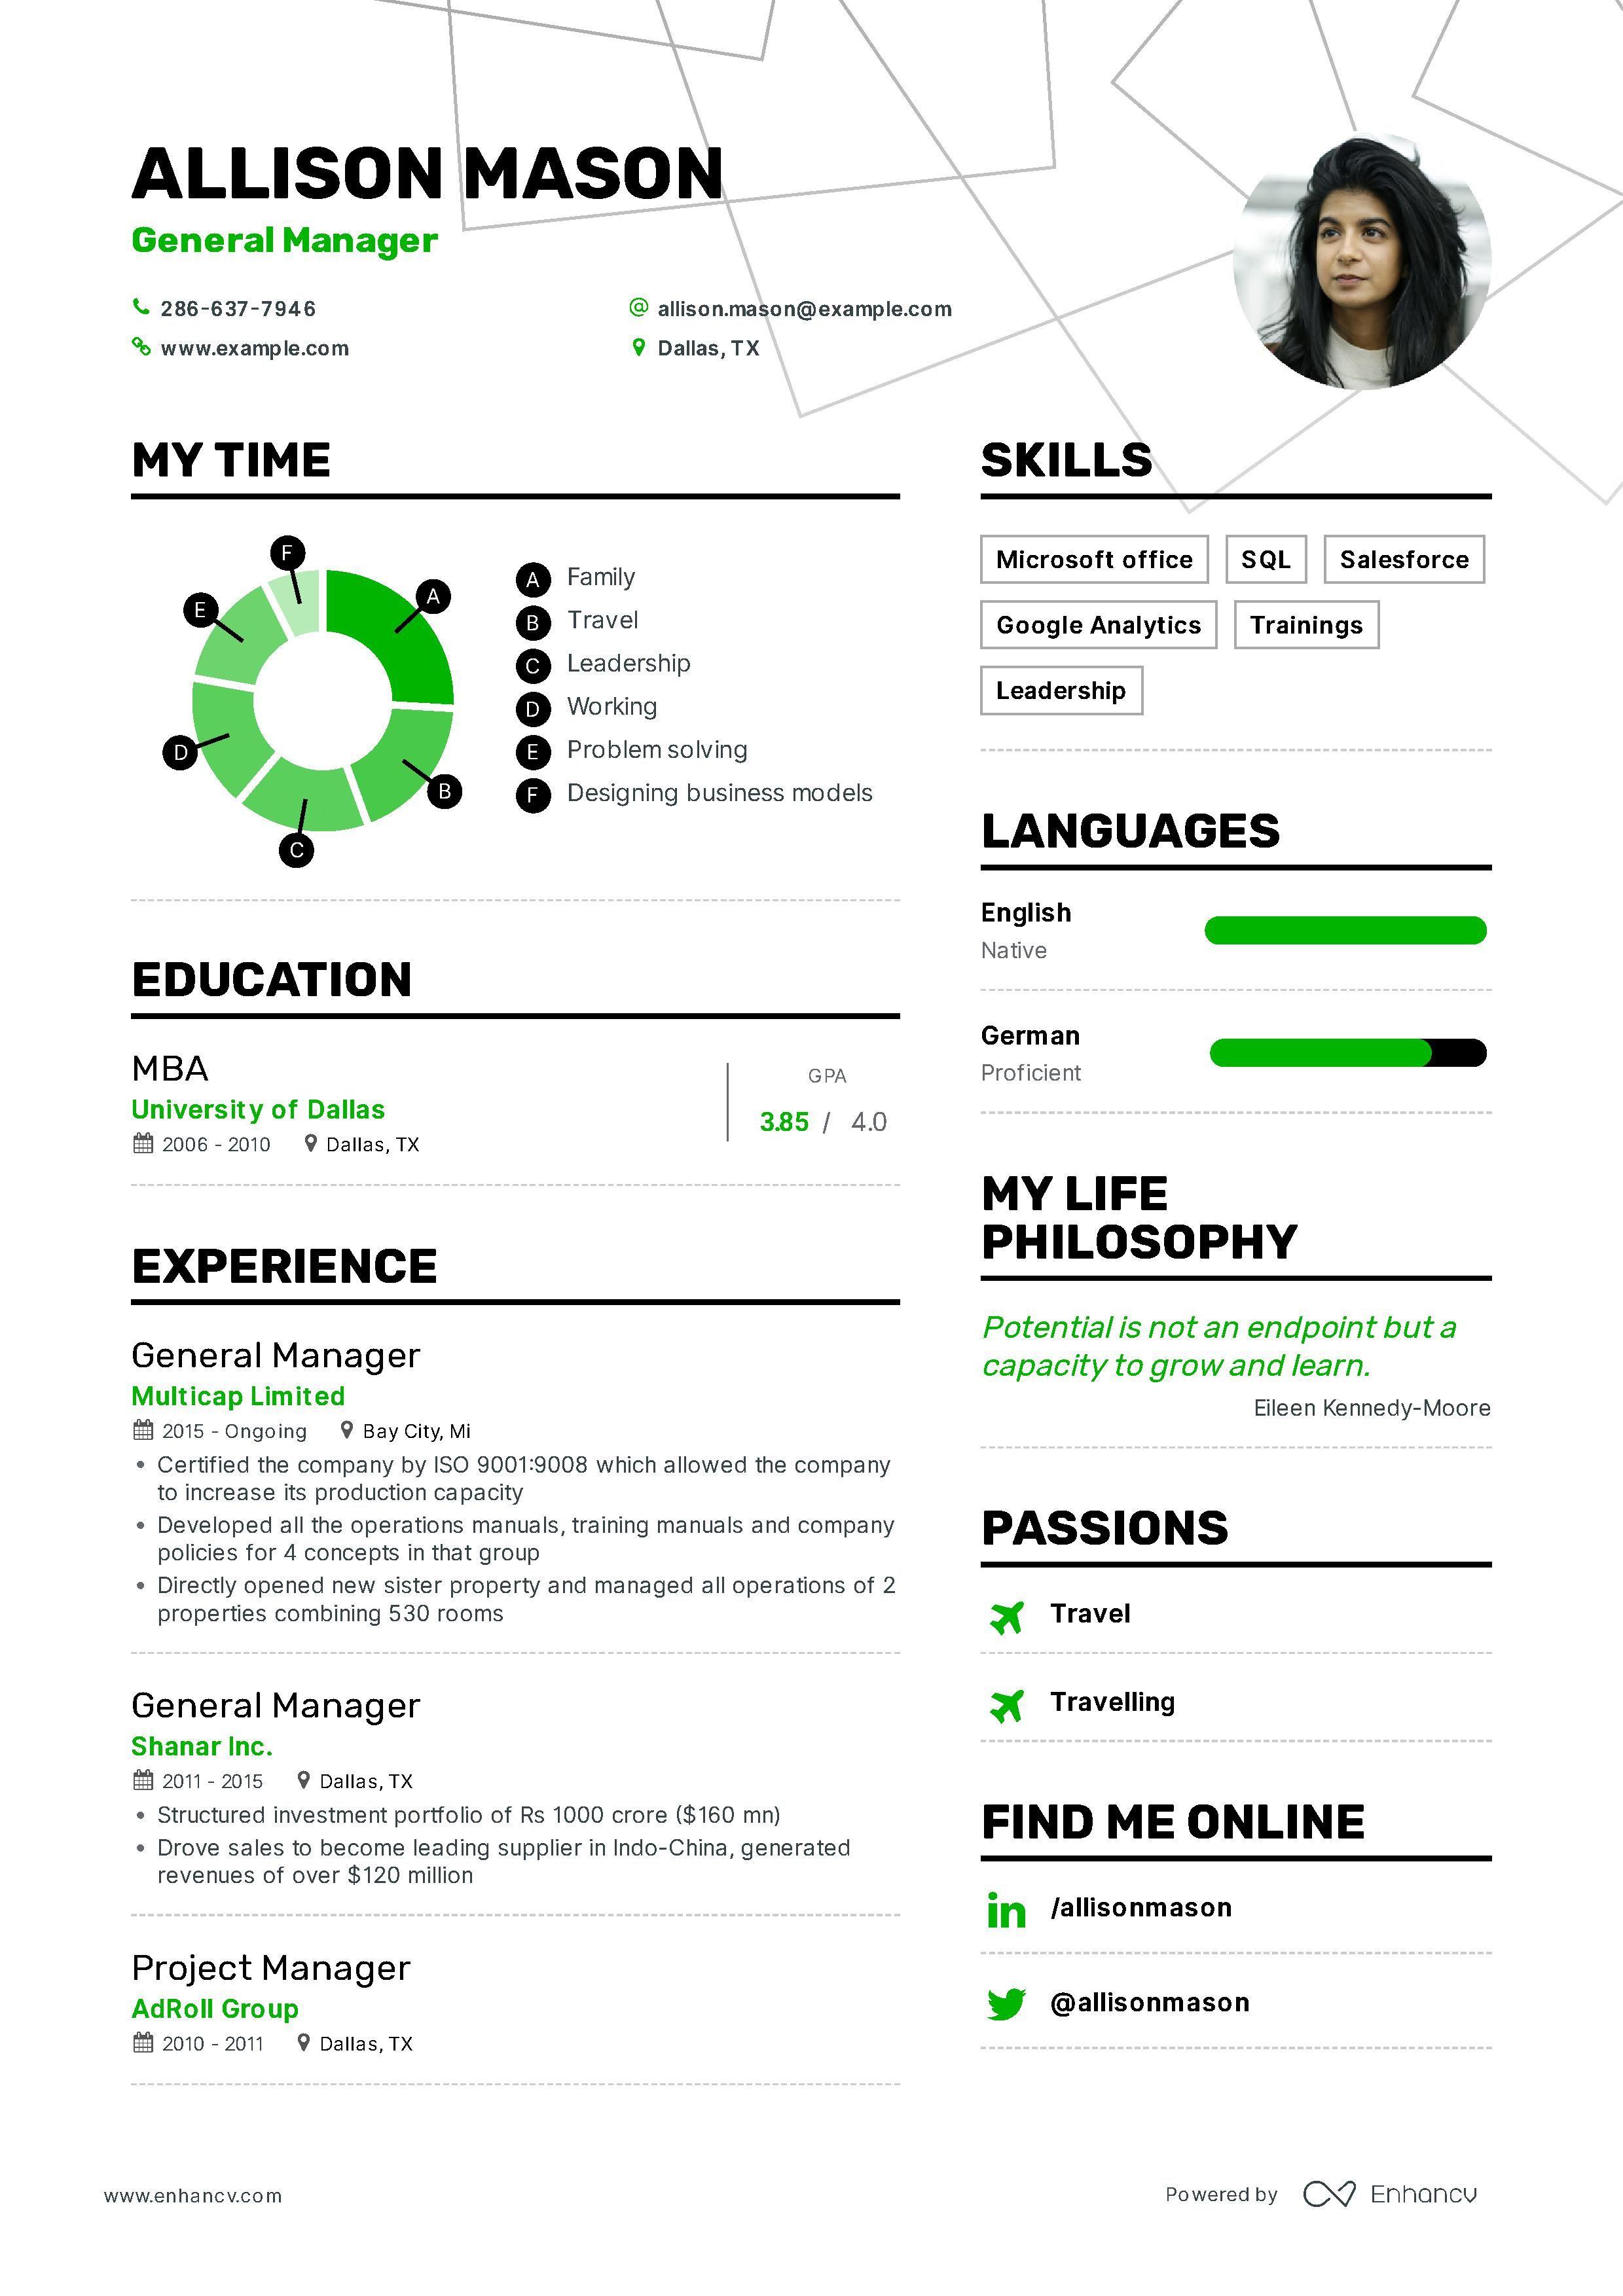 Resume Textos Online Gratis